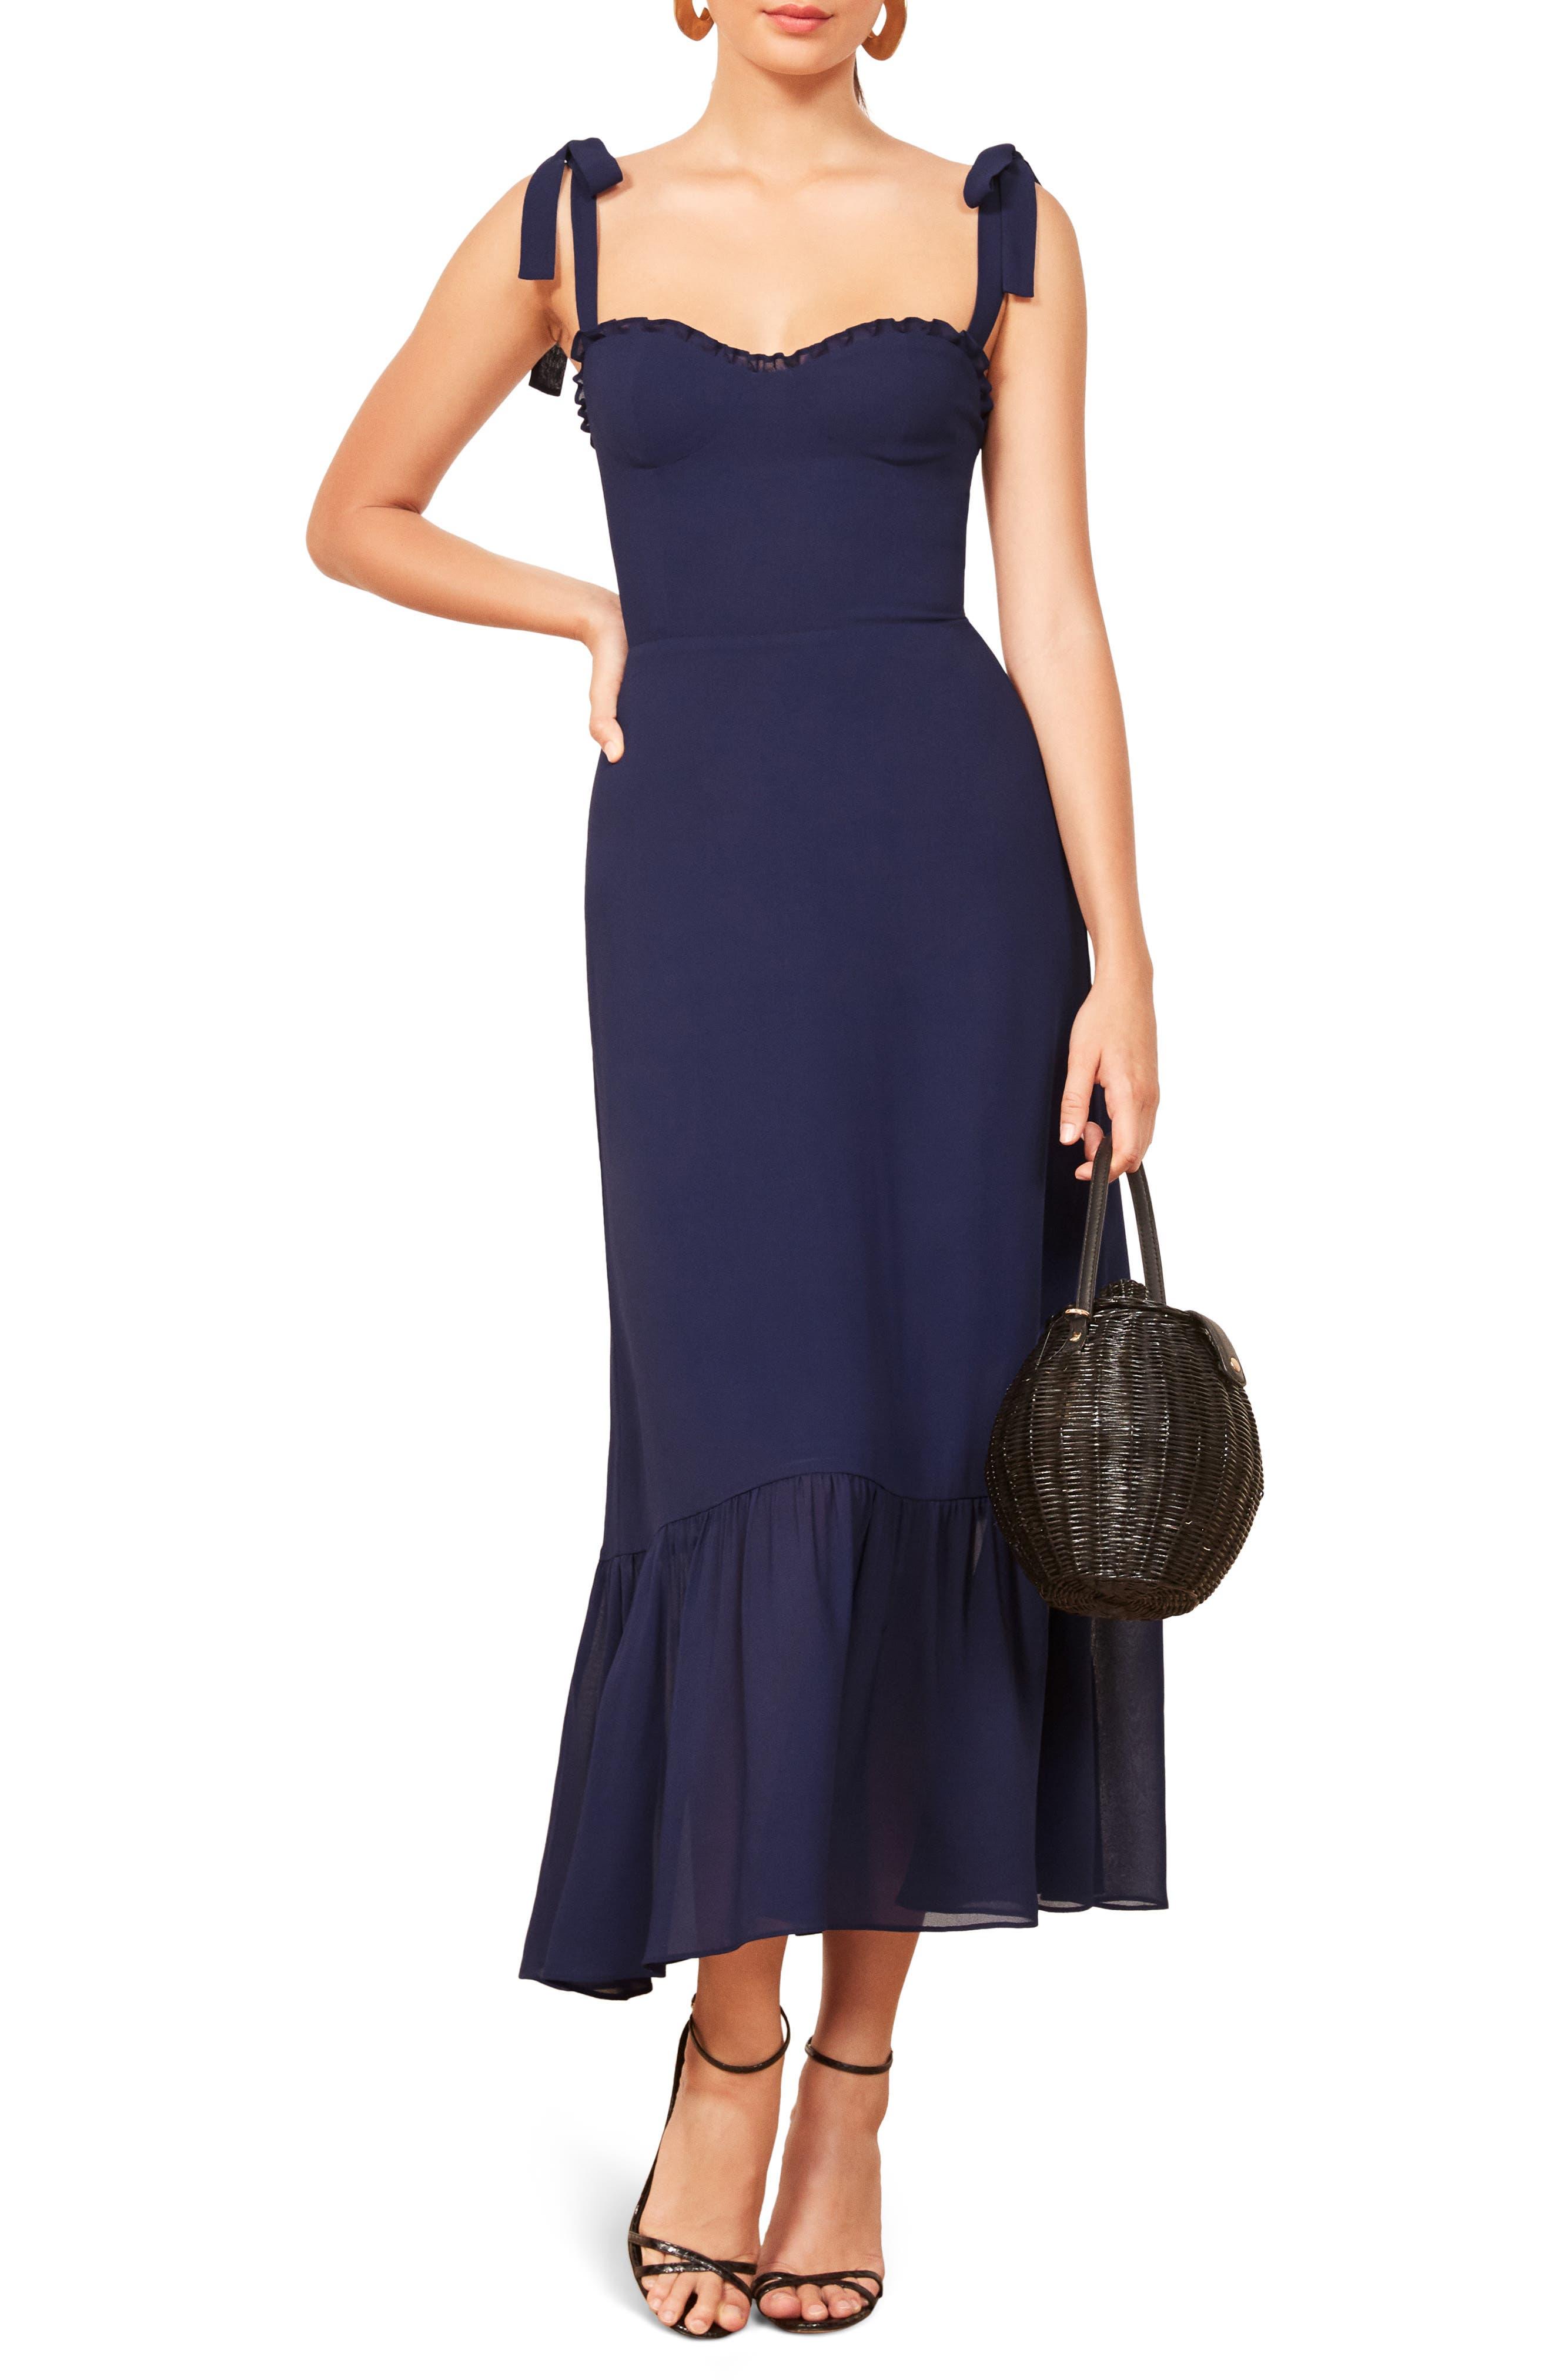 Nikita Floral Midi Dress,                             Main thumbnail 1, color,                             400